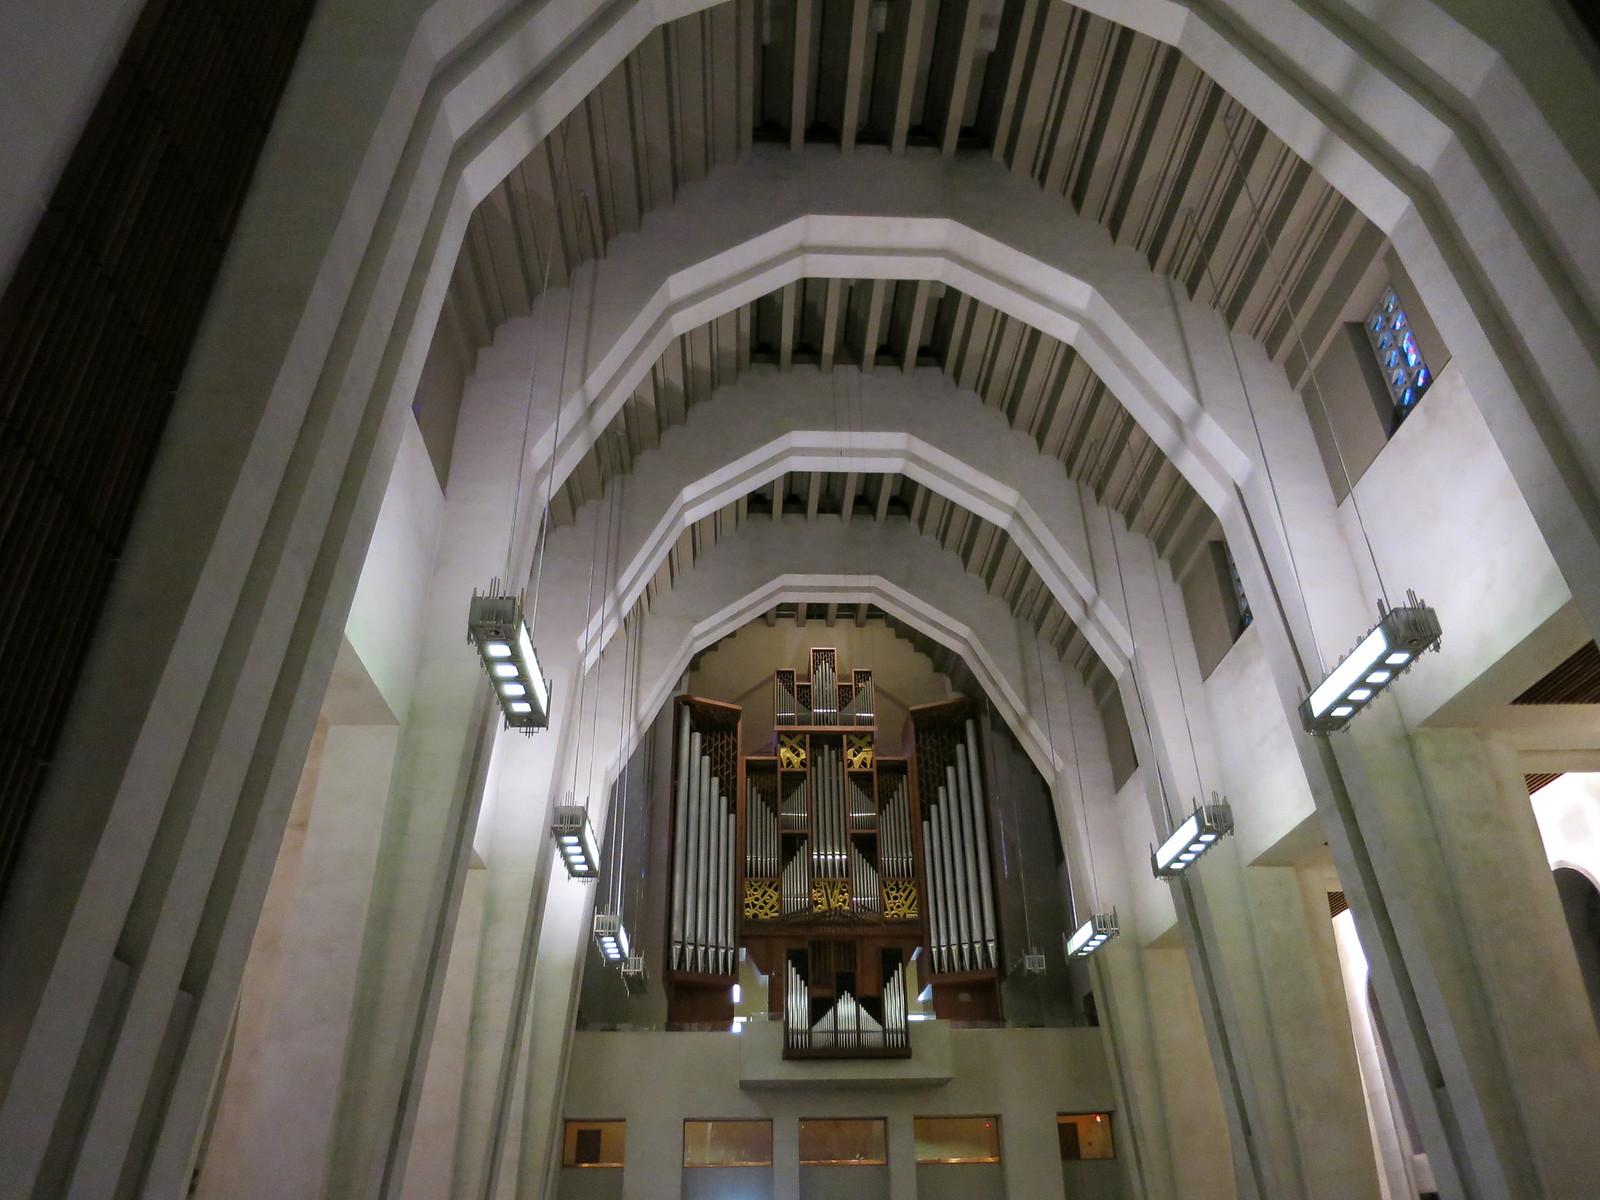 St. Joseph's Oratory organ